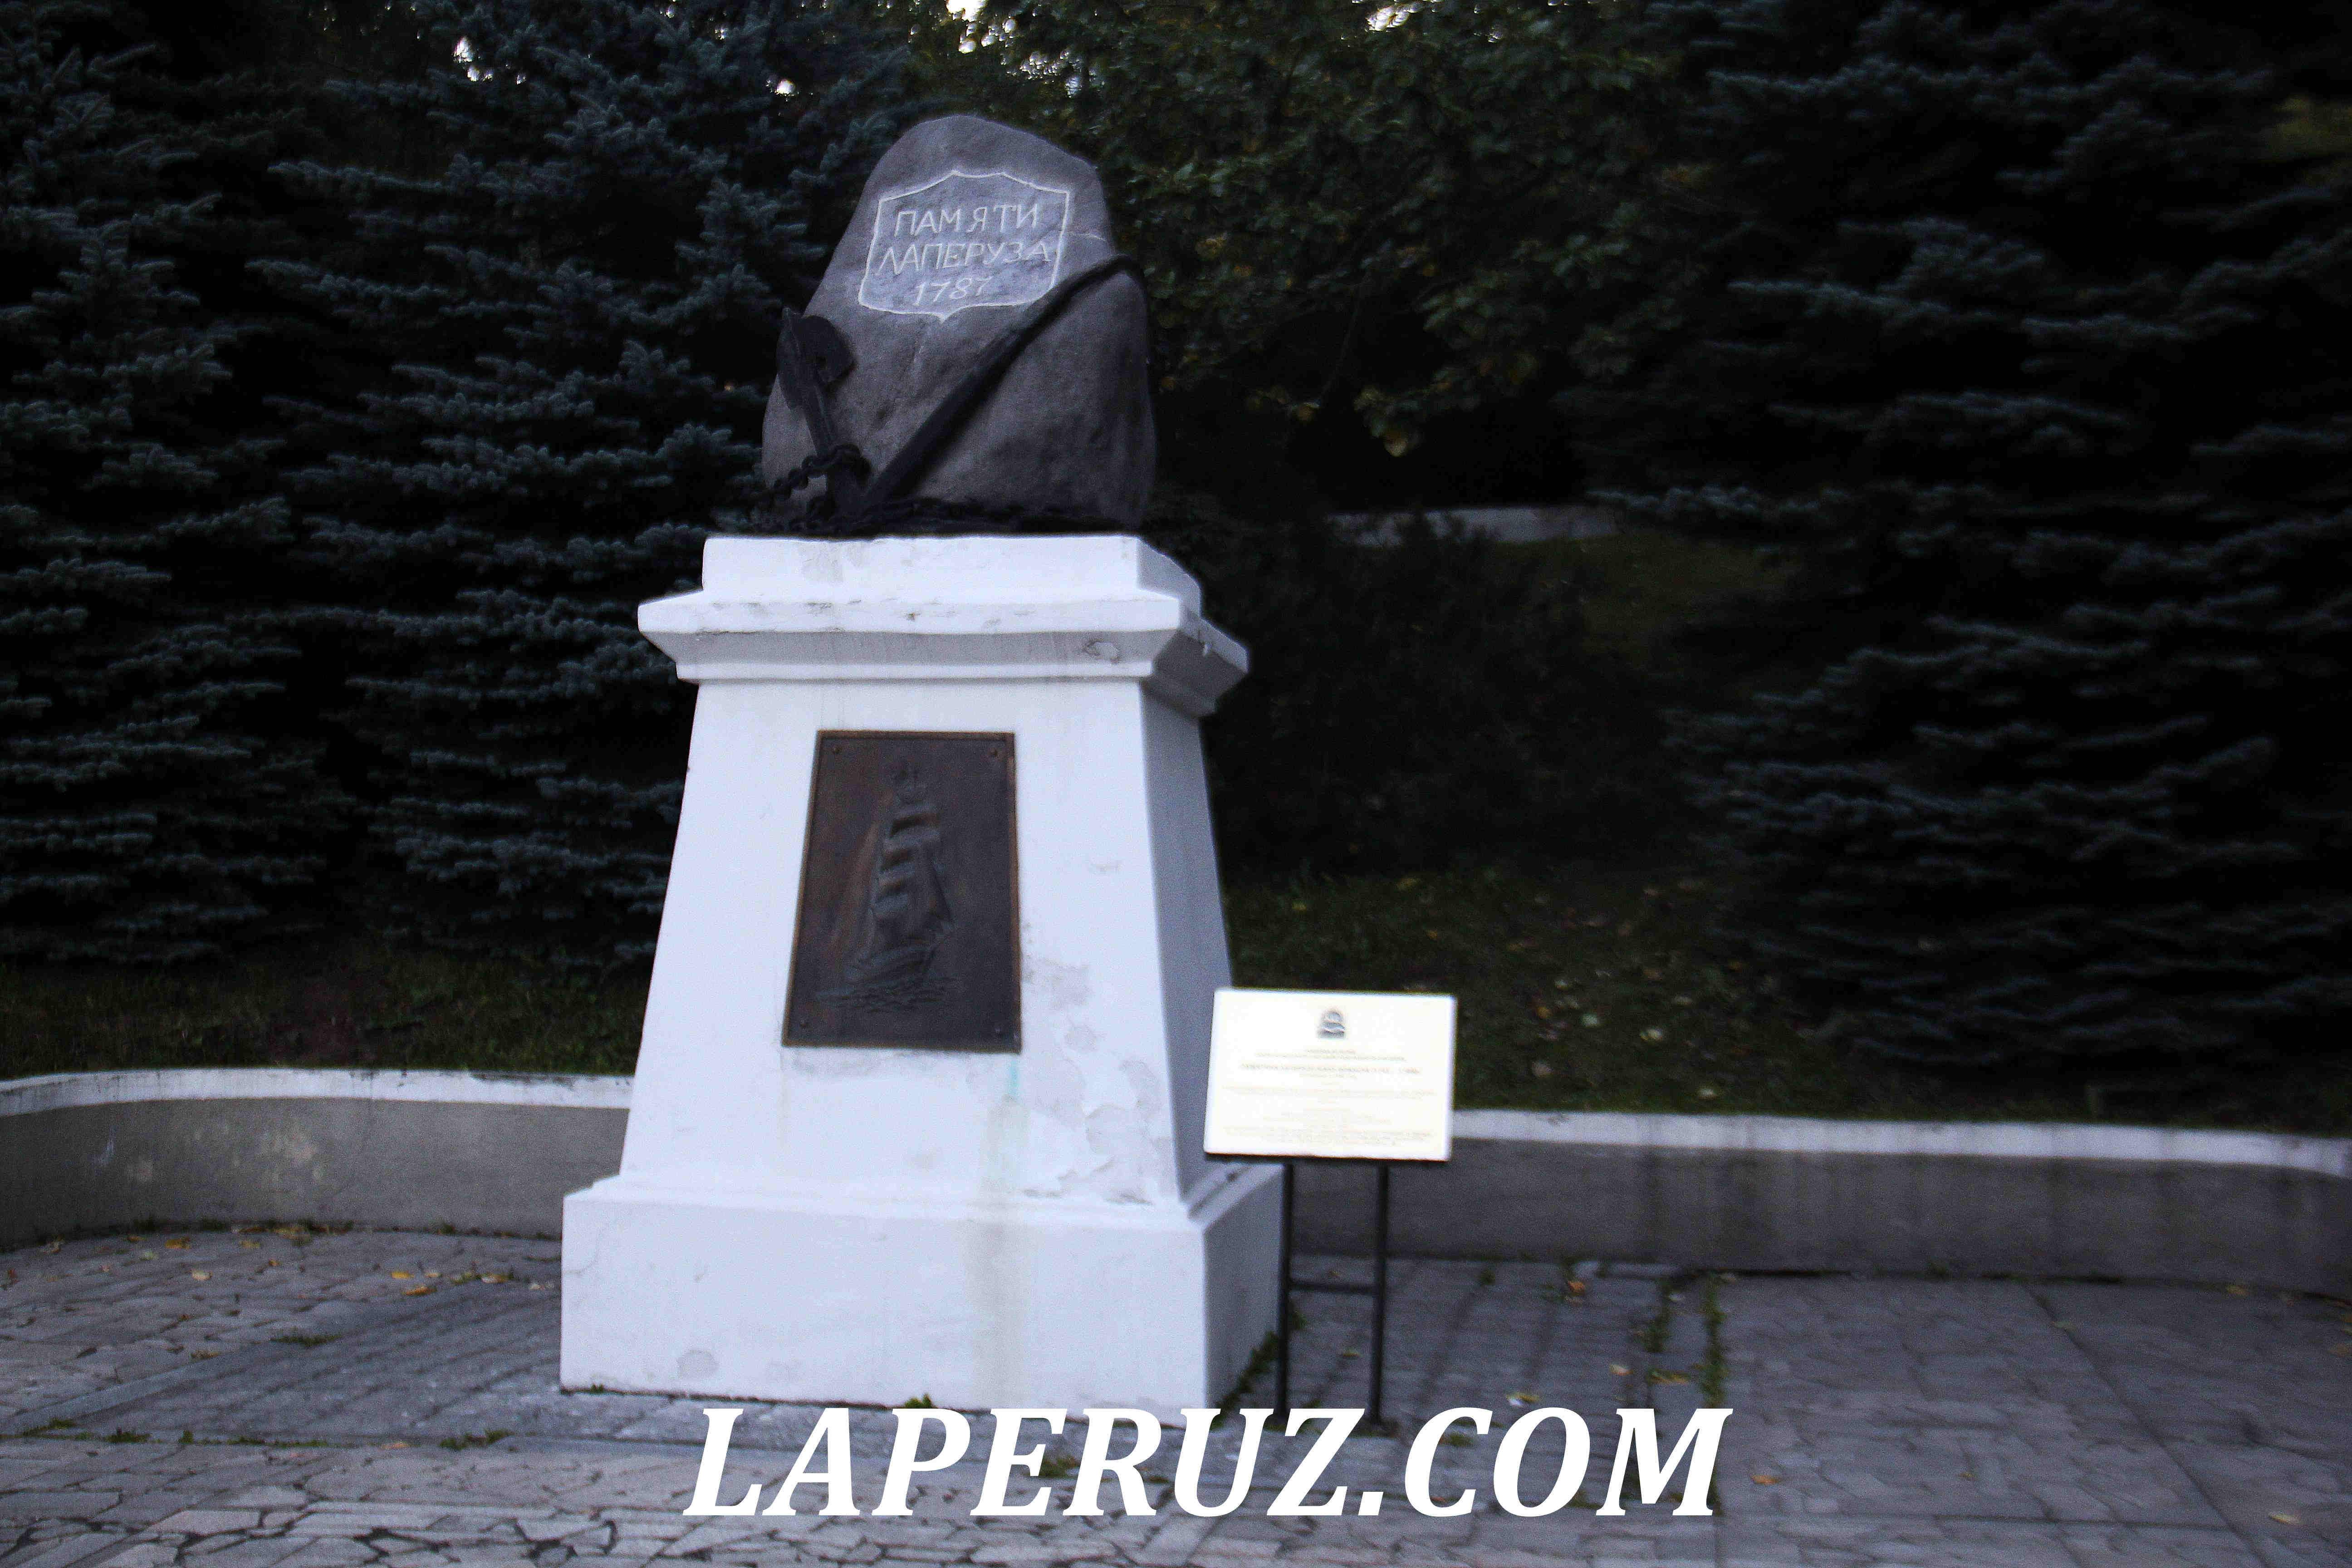 petropavlovsk_kamchatskii_laperuz_1